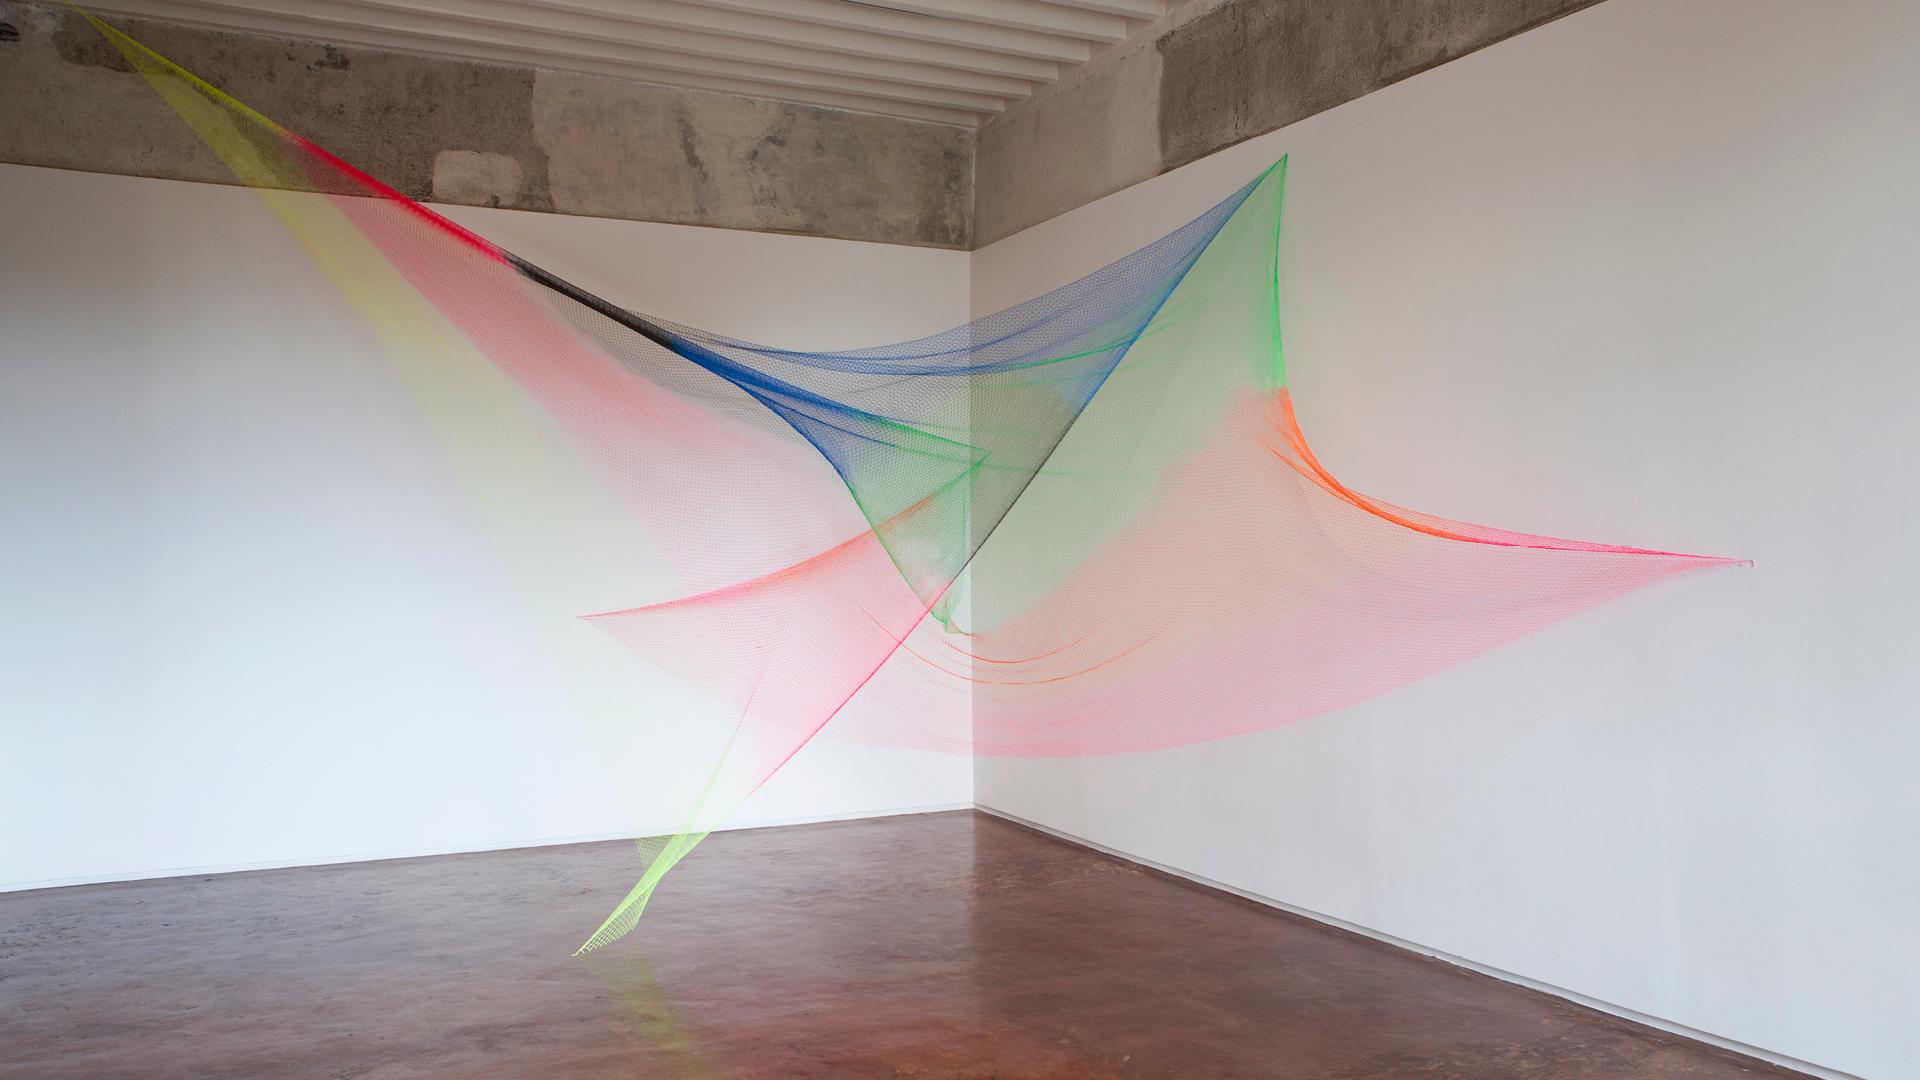 Rana Begum, No. 950 Net, 2019, spray painted fishing net, dimensions variable | Rana Begum | STIRworld